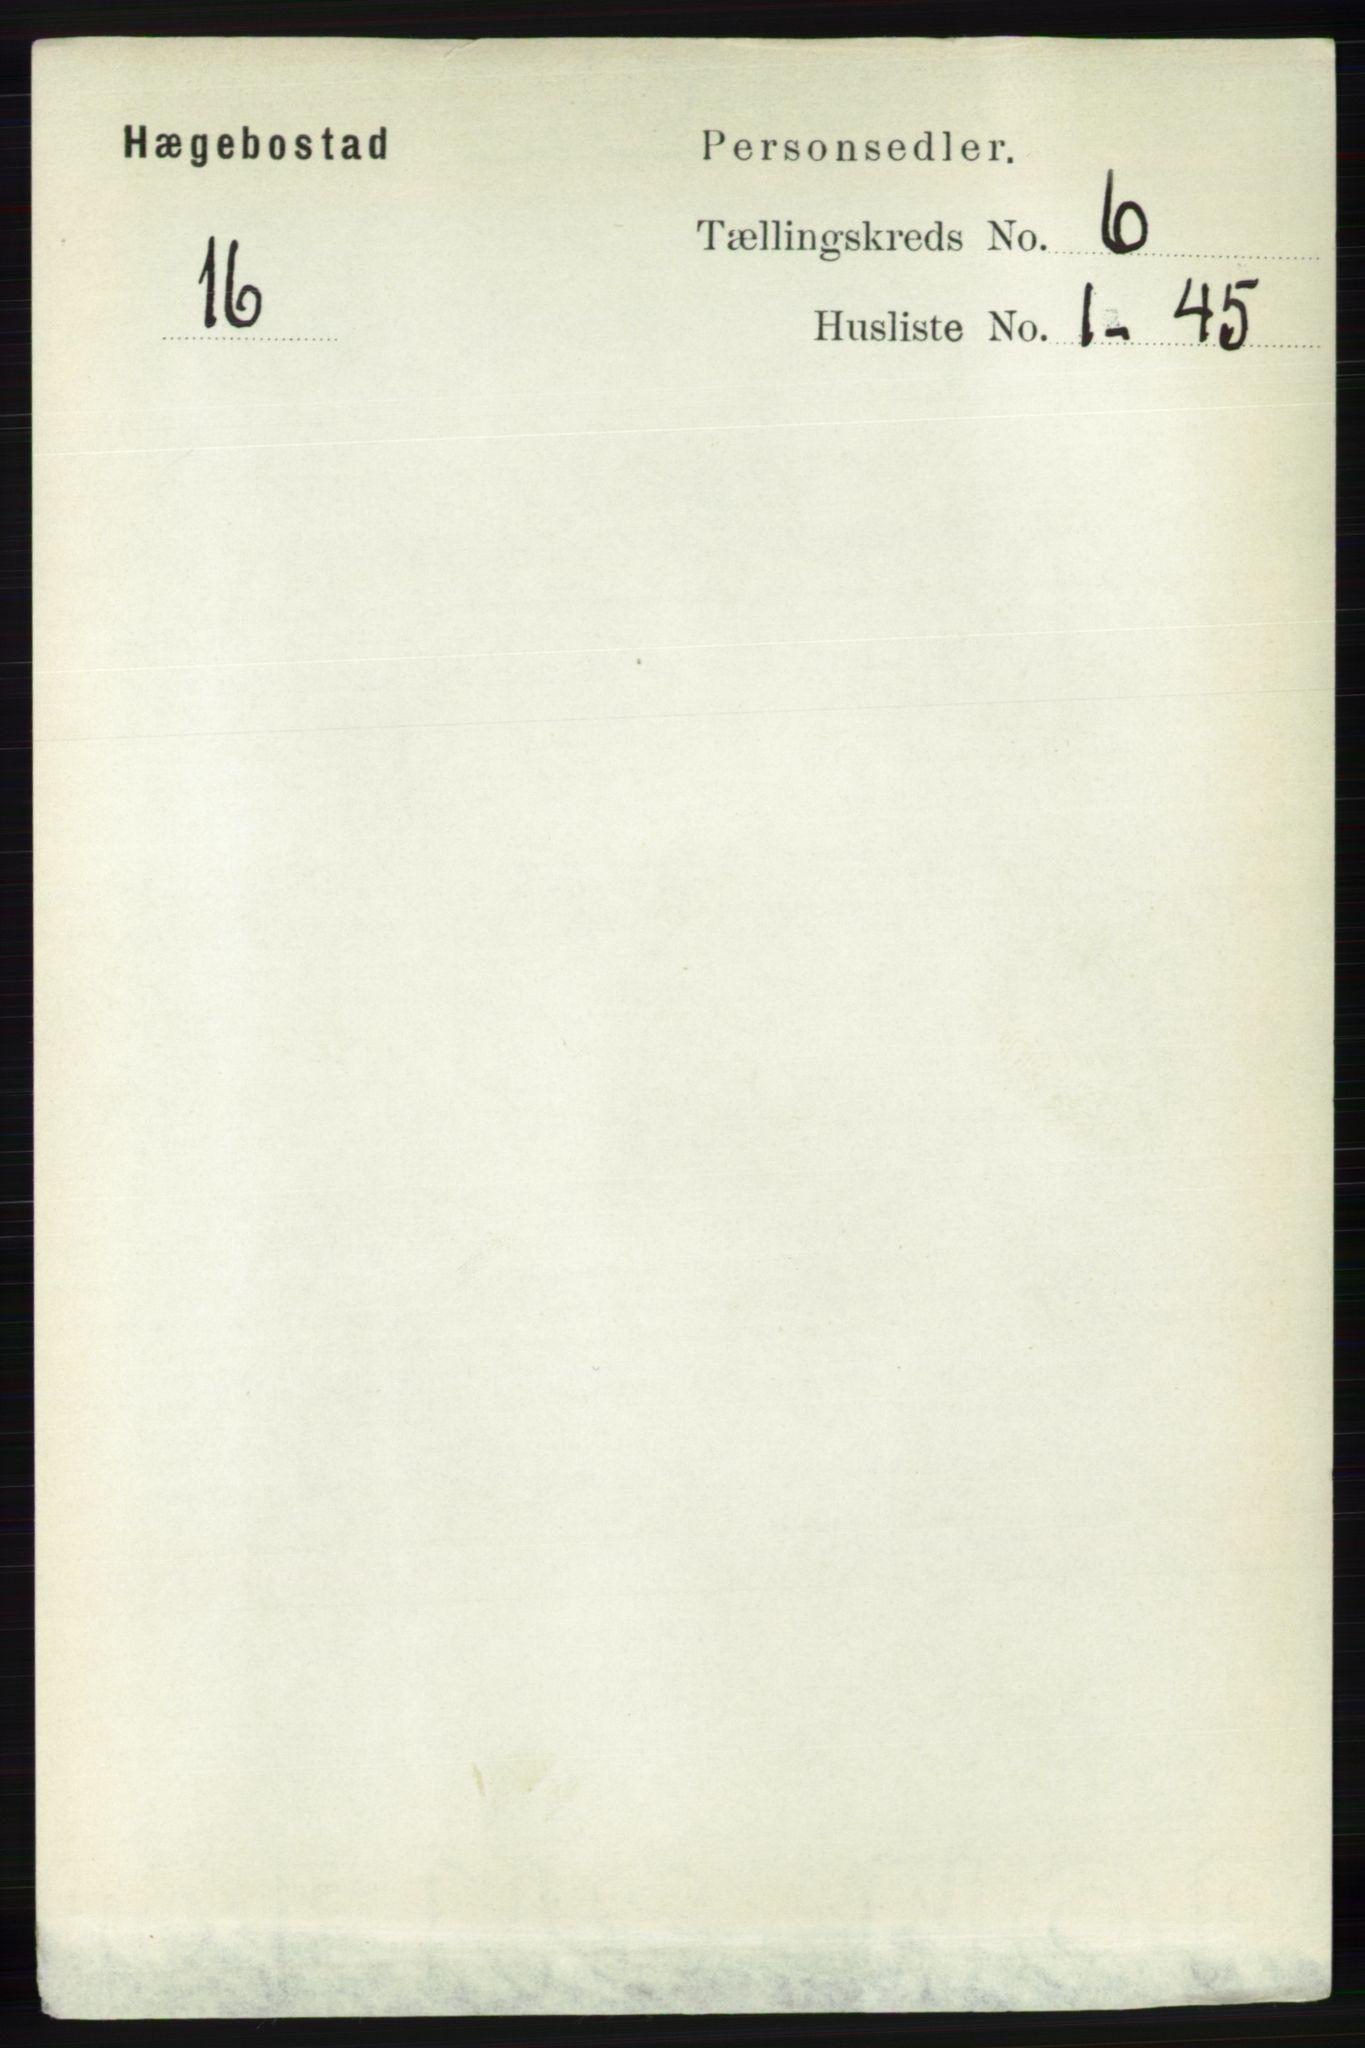 RA, Folketelling 1891 for 1034 Hægebostad herred, 1891, s. 1843